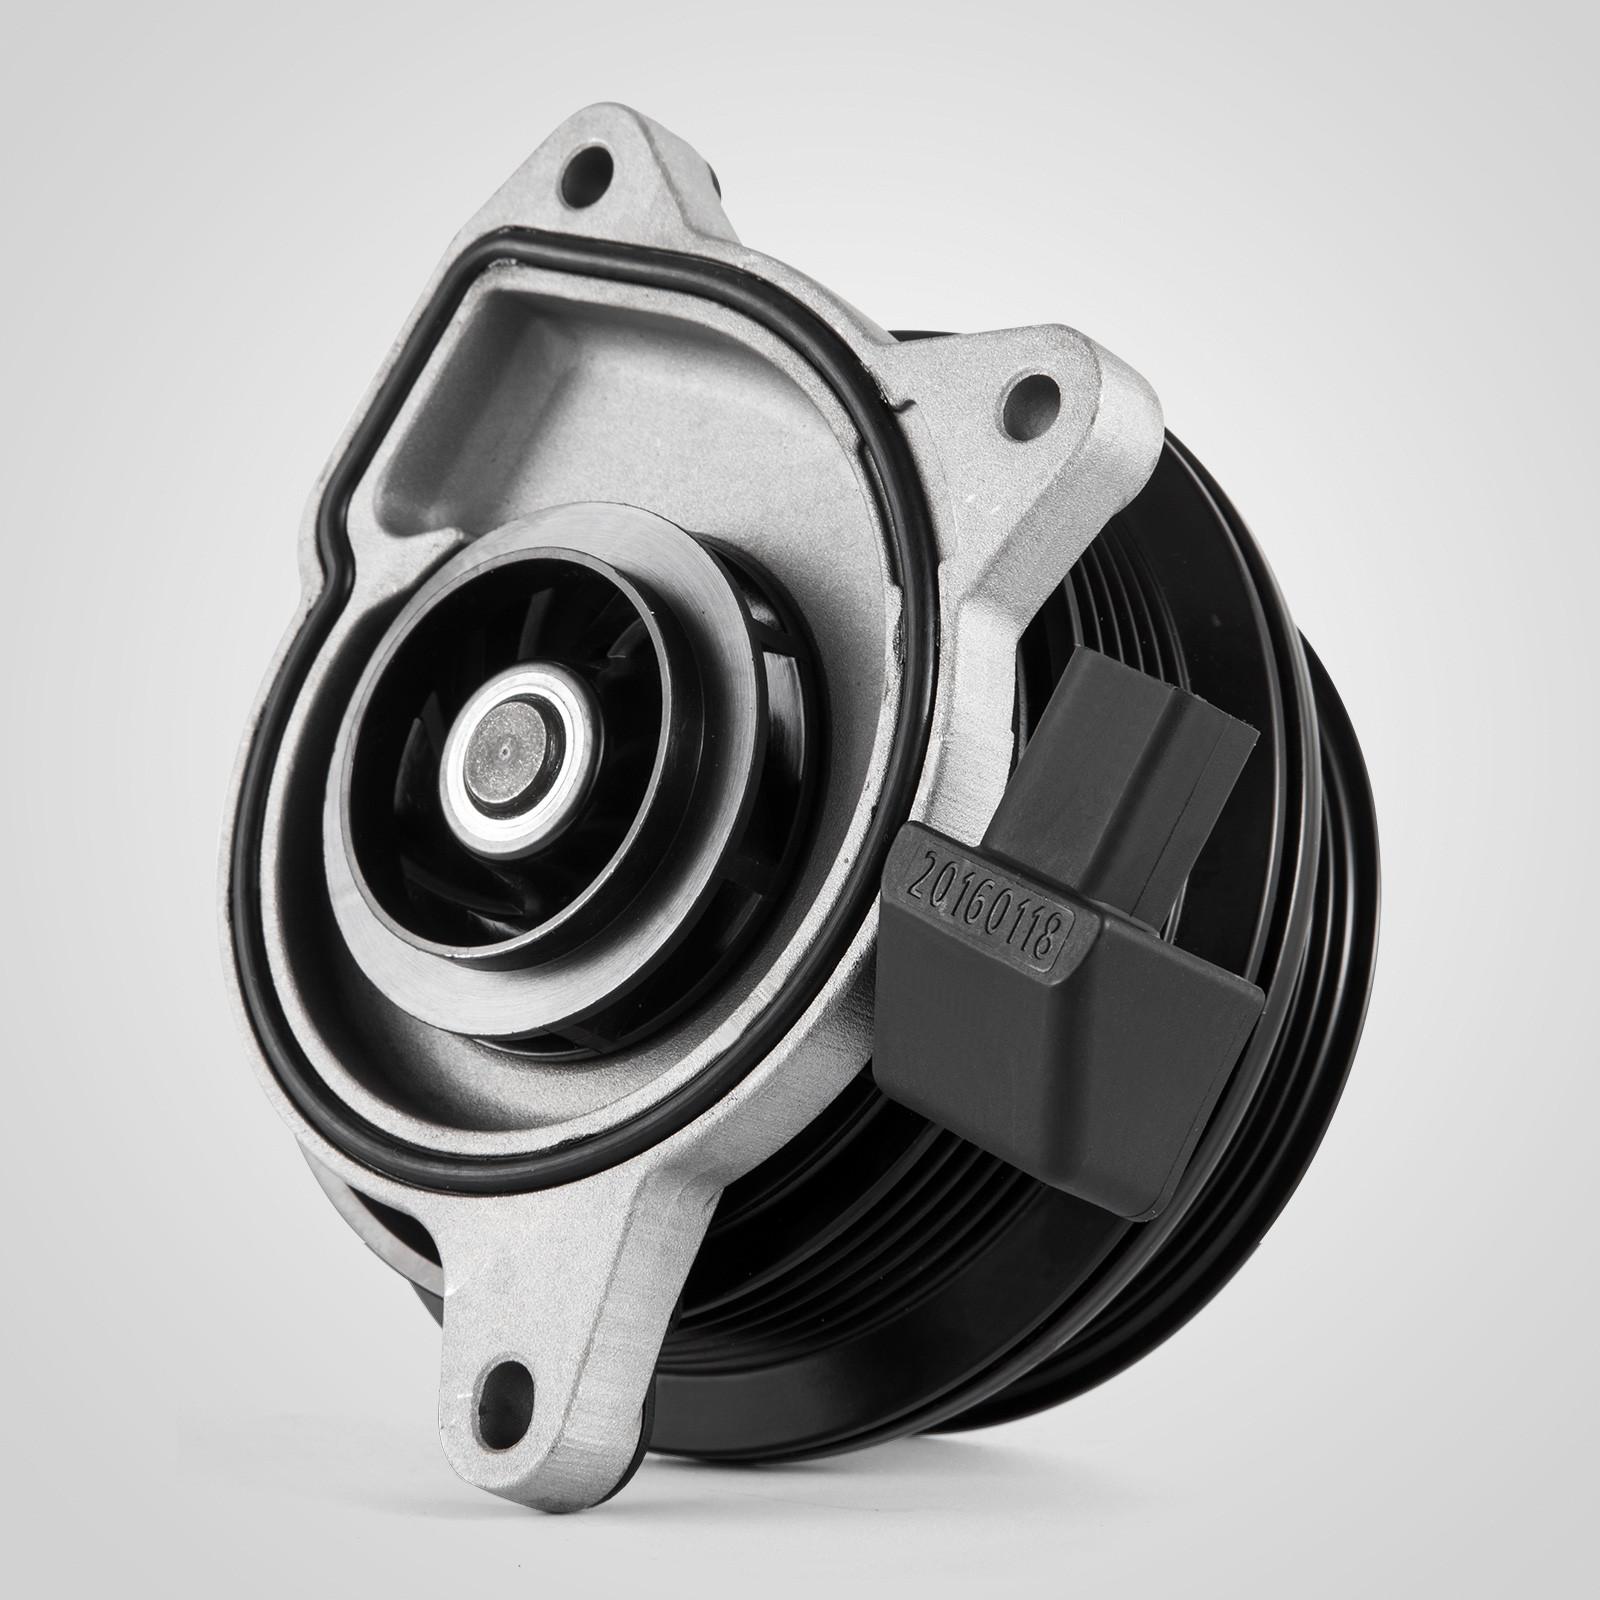 small resolution of 8 new volkswagen audi skoda golf mk6 beetle water pump